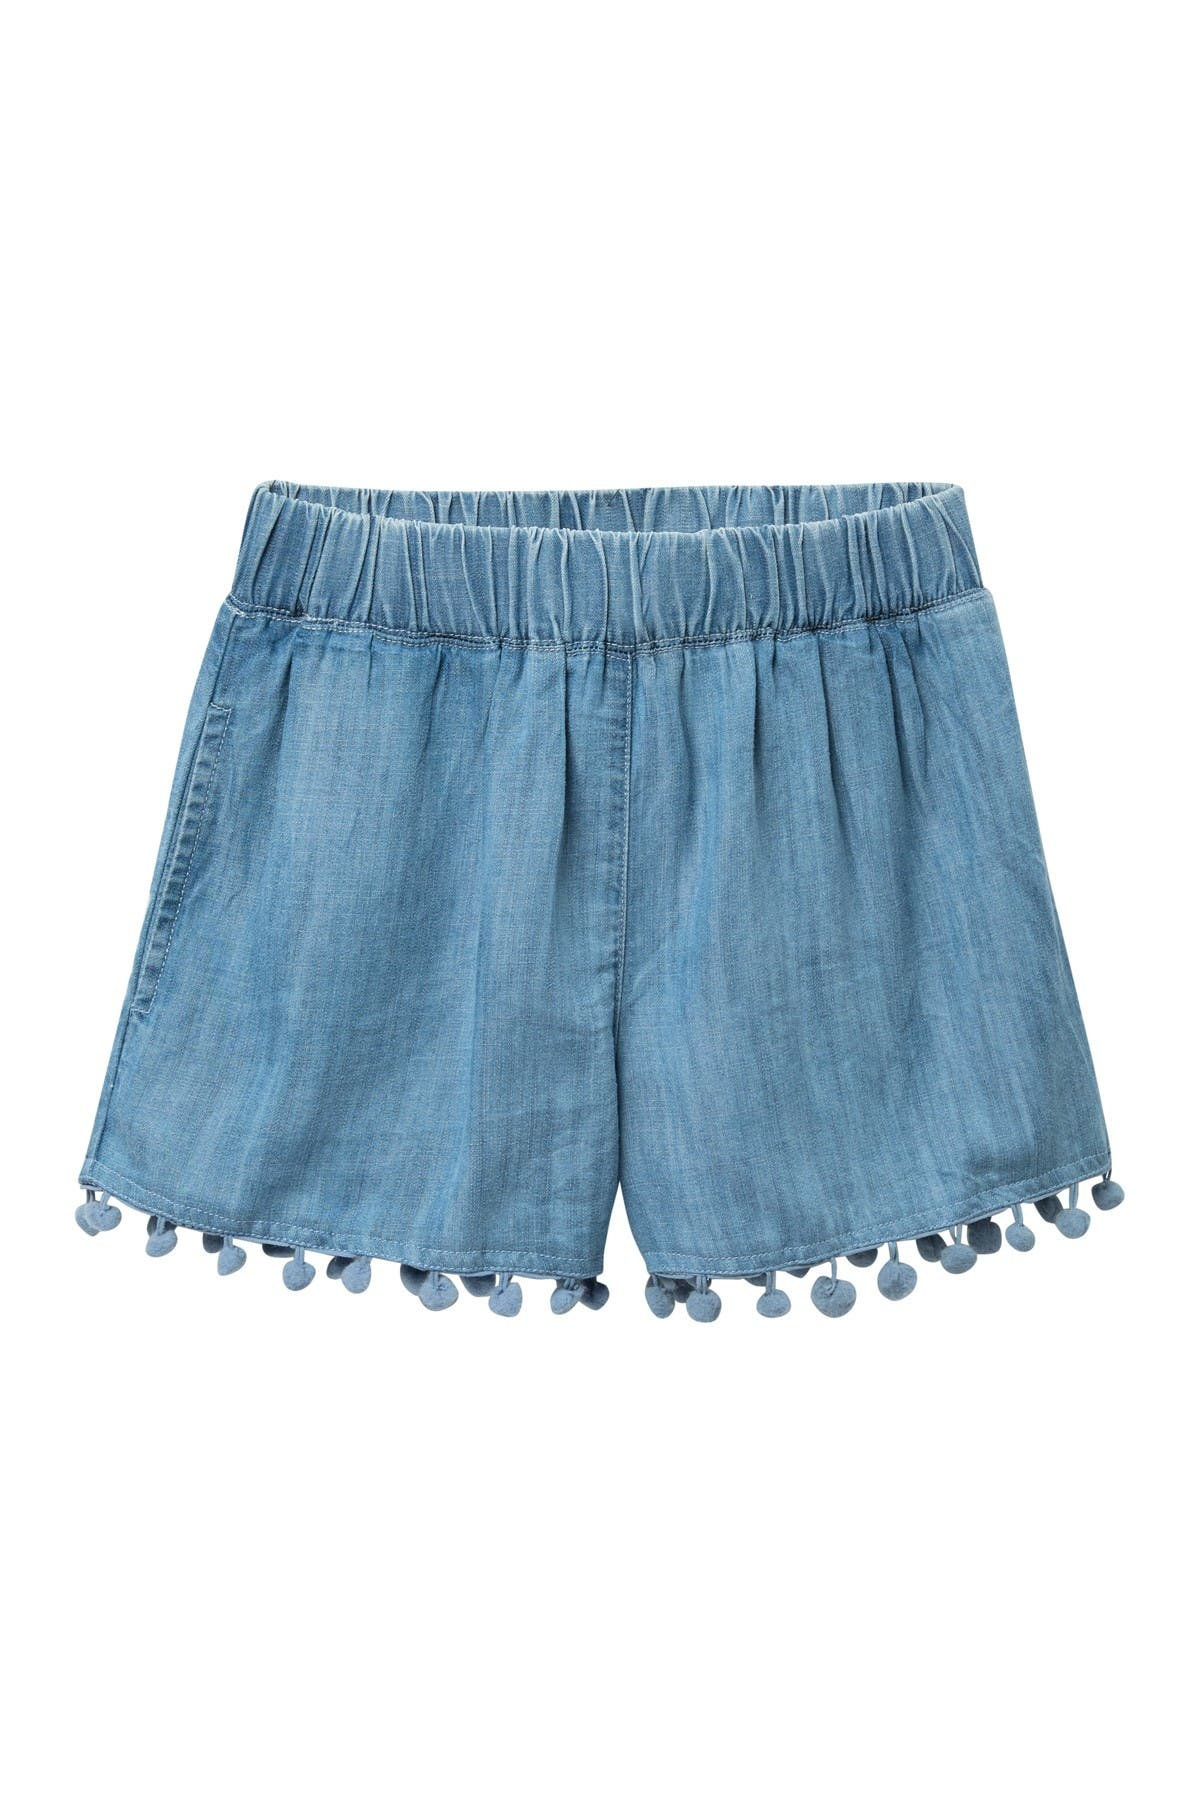 Ella Moss Pompom Shorts